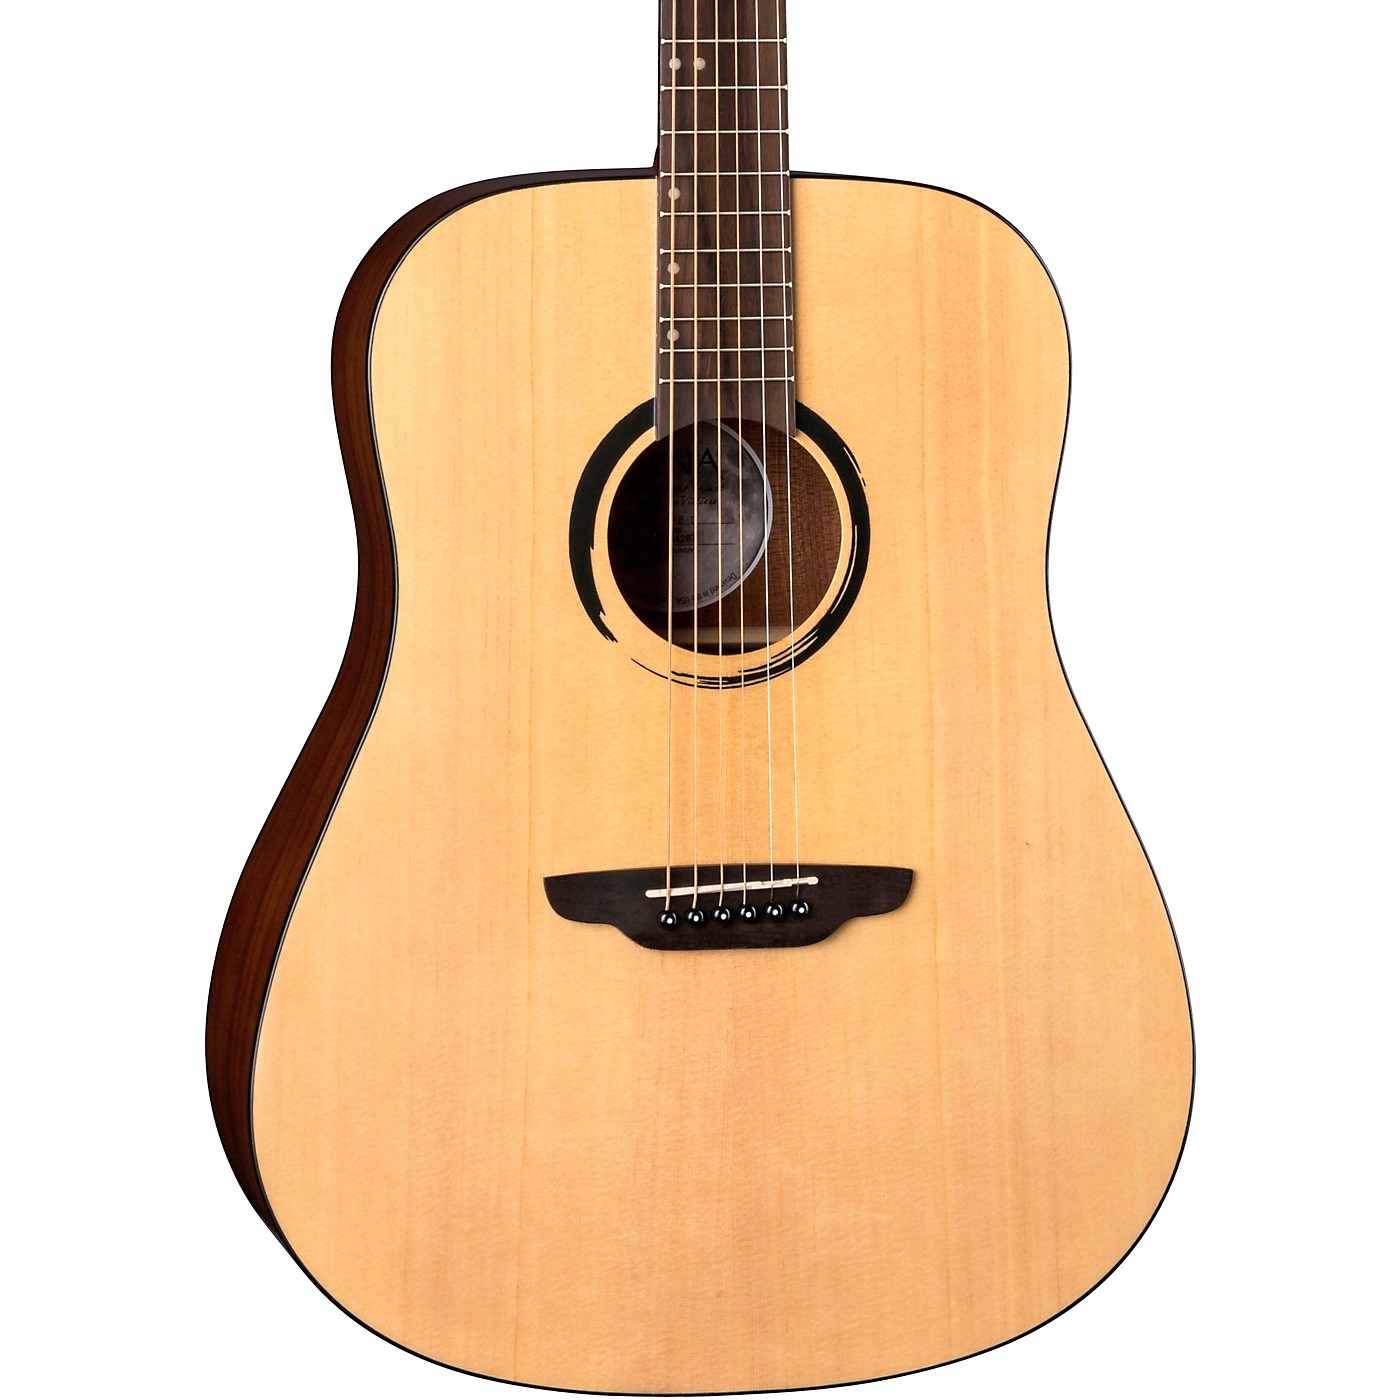 Luna Guitars WABI SABI Dreadnought Solid-Top Acoustic Guitar thumbnail